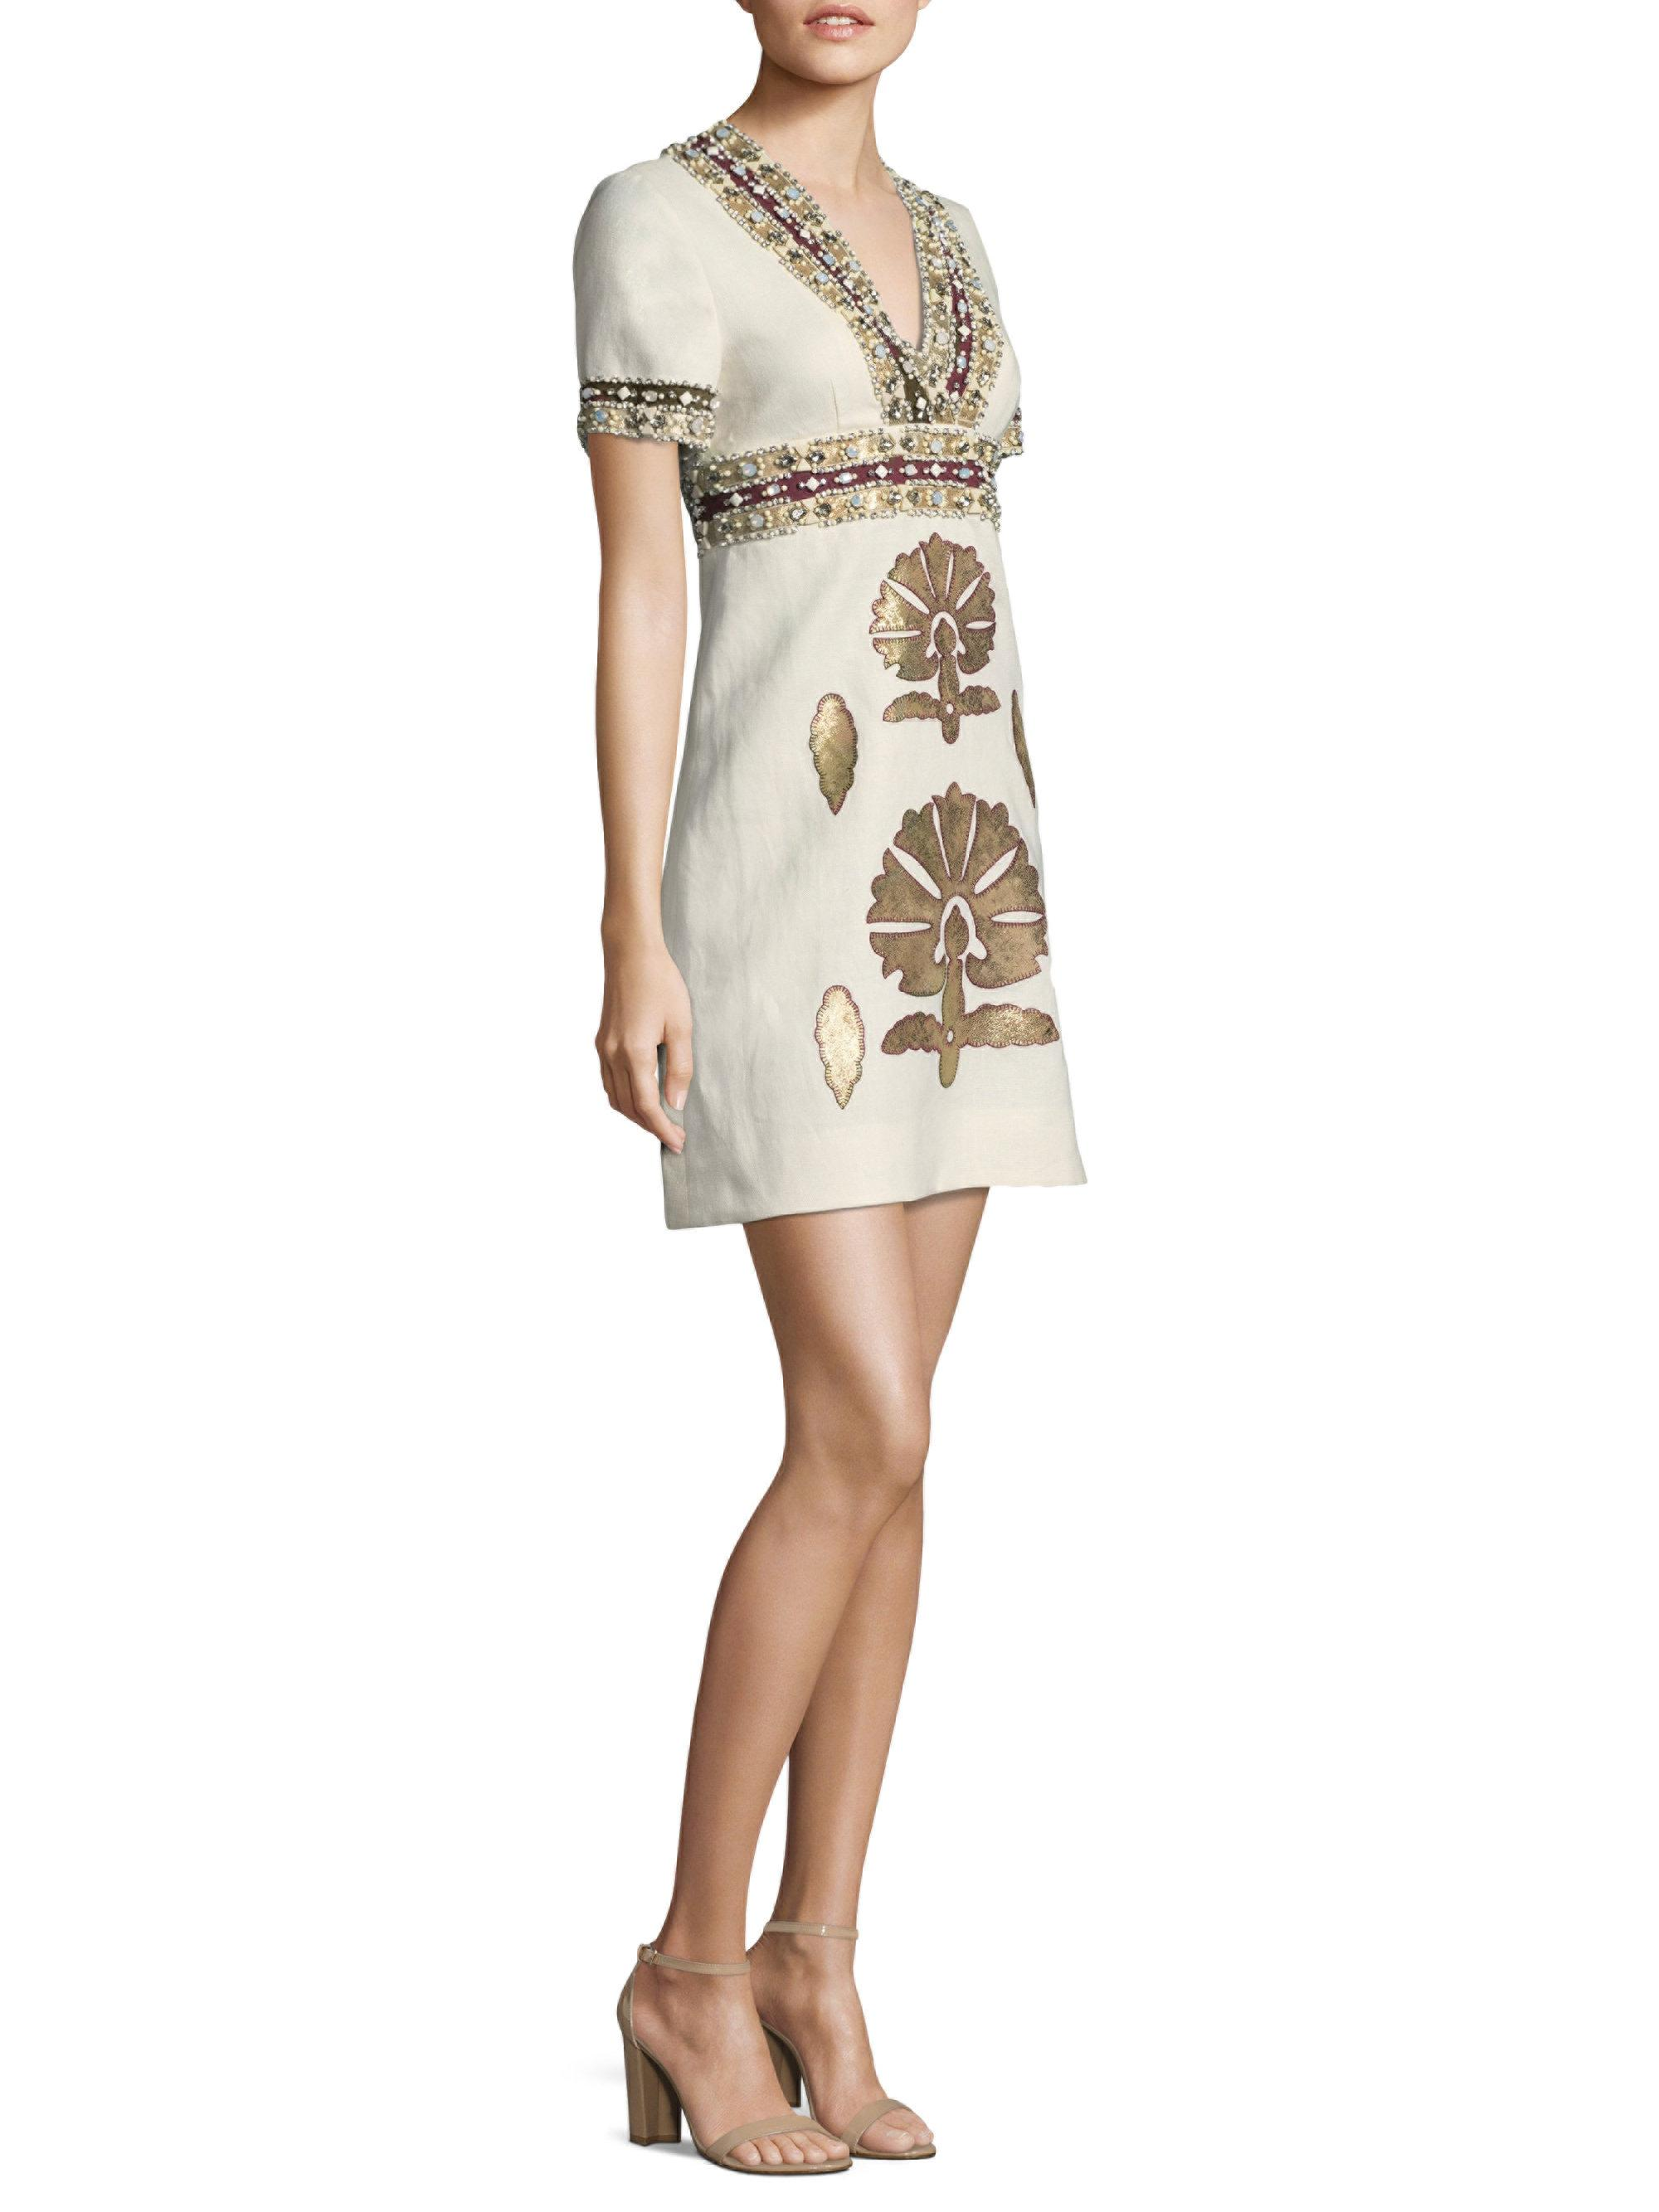 77db5507c85 Tory Burch Anya Embellished Linen Mini Dress in White - Lyst